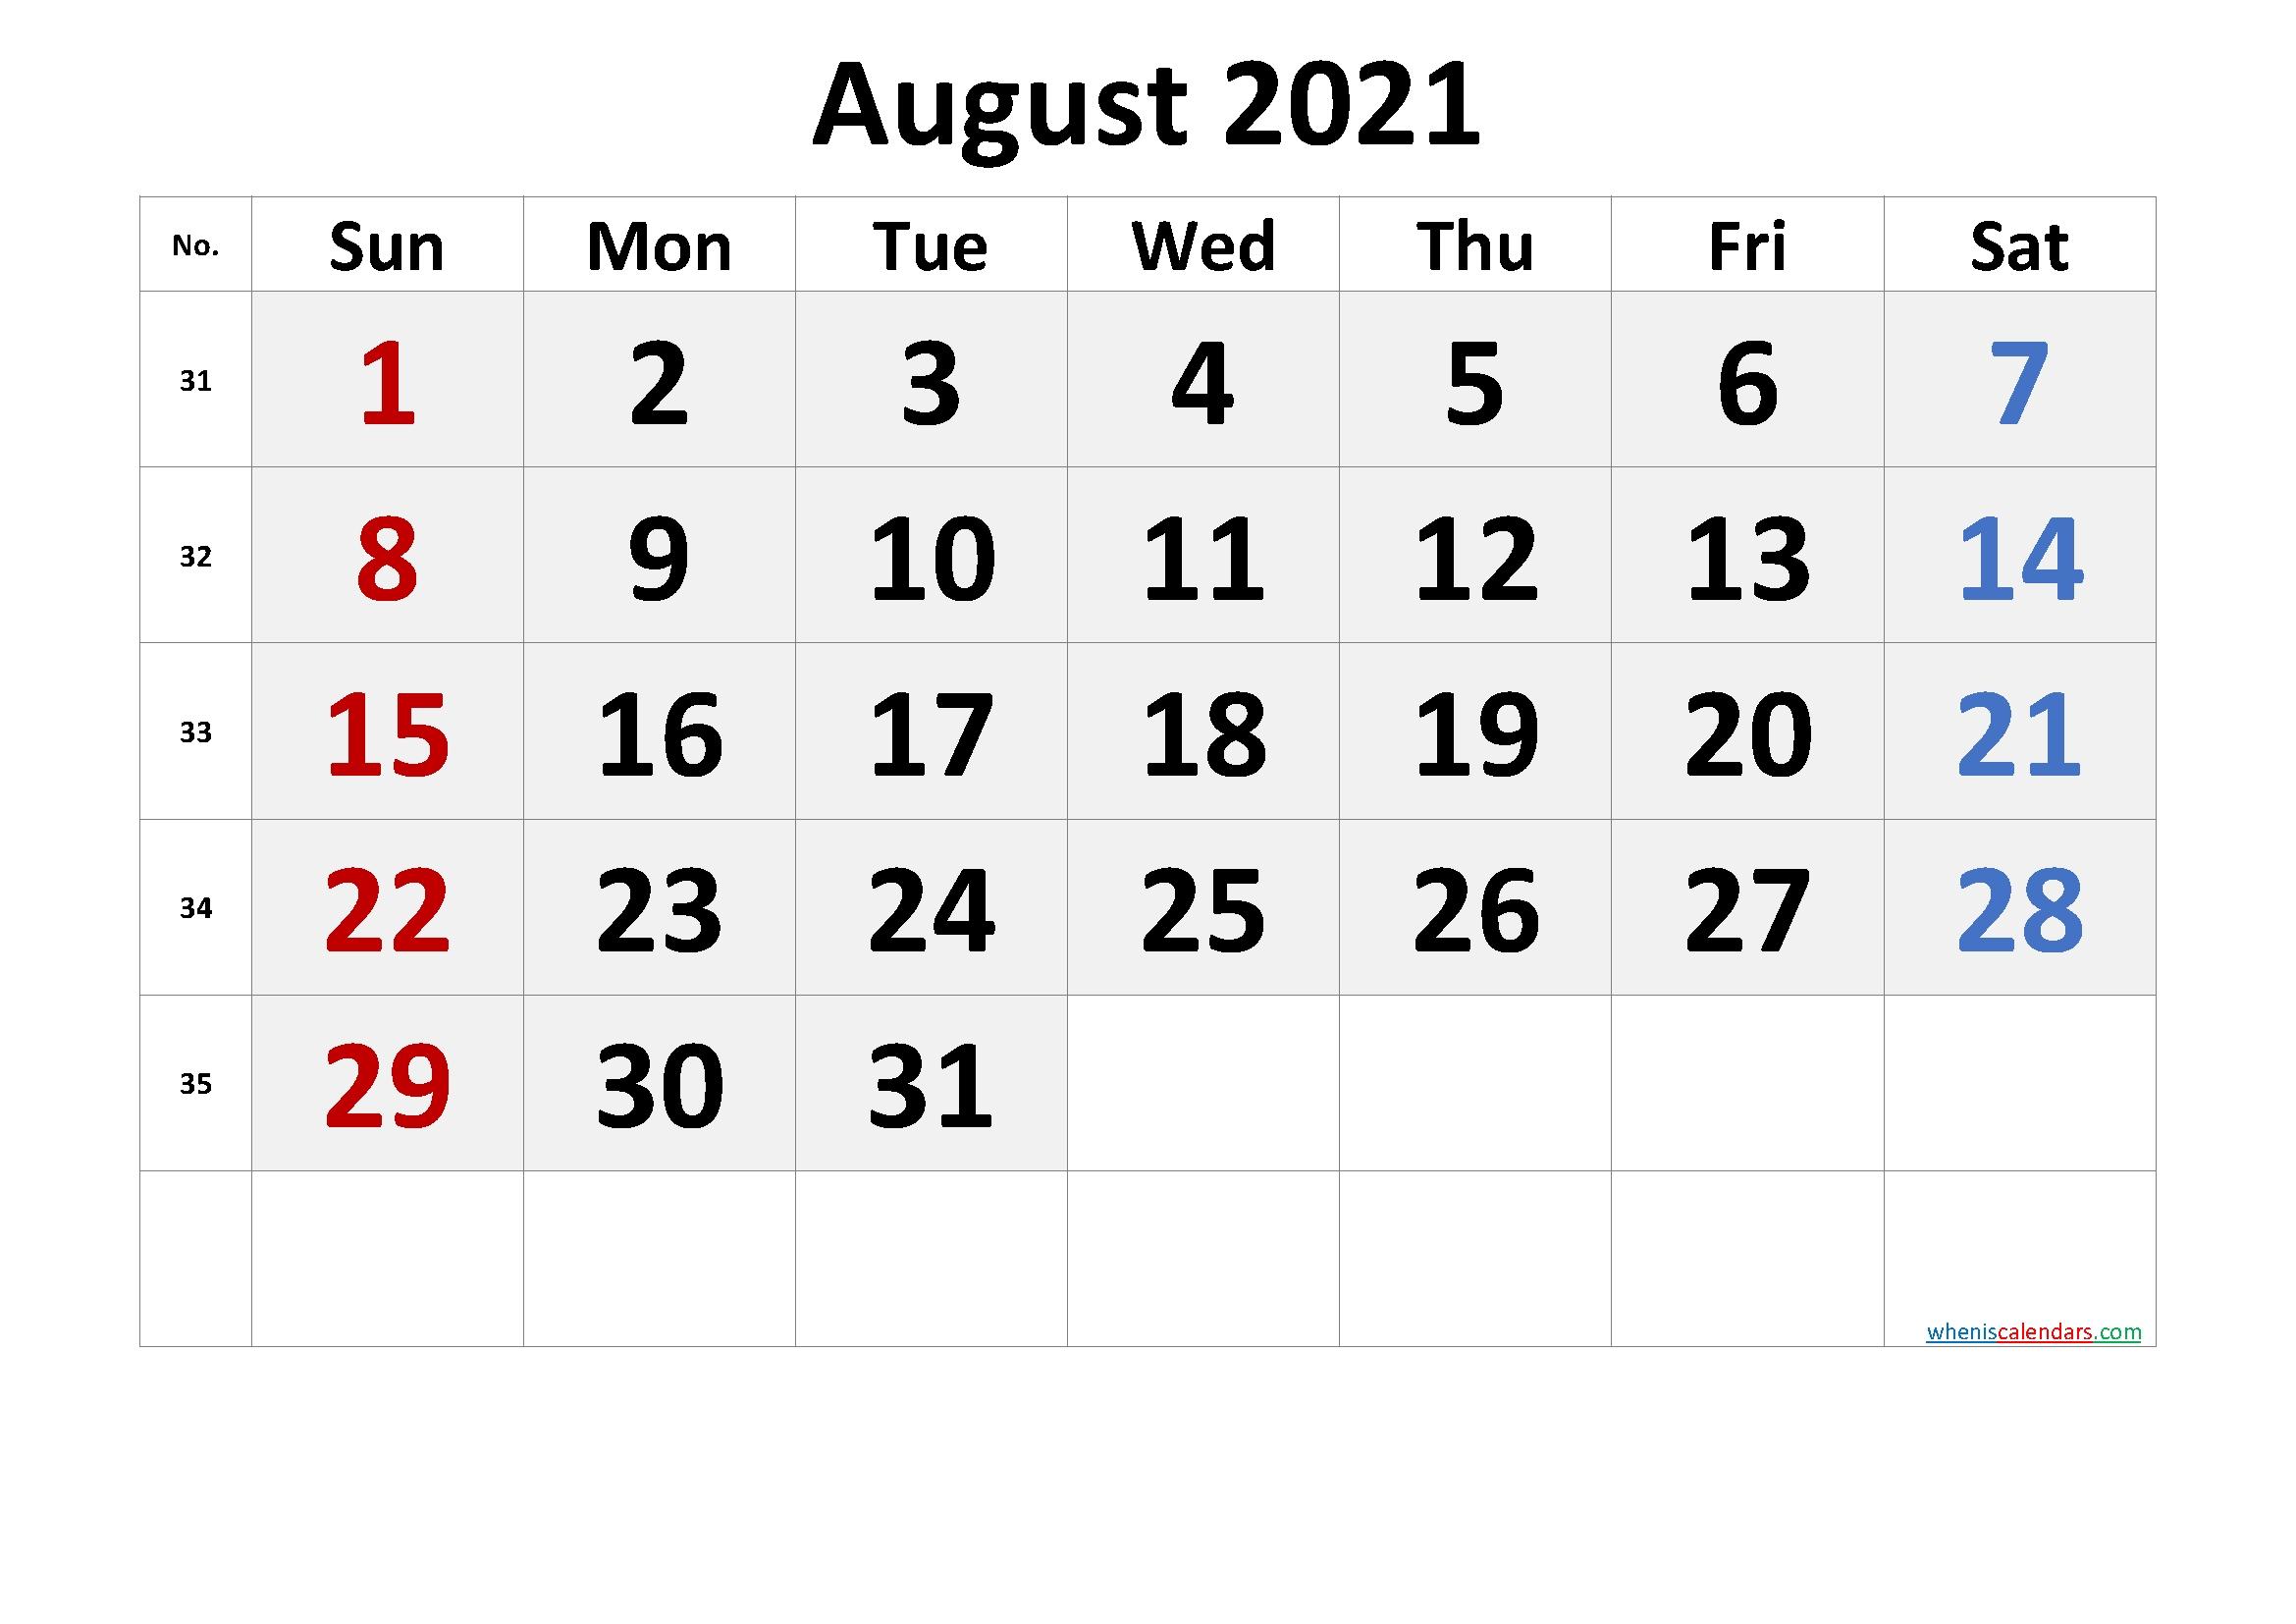 Free Printable August 2021 Calendar In 2020 | Calendar